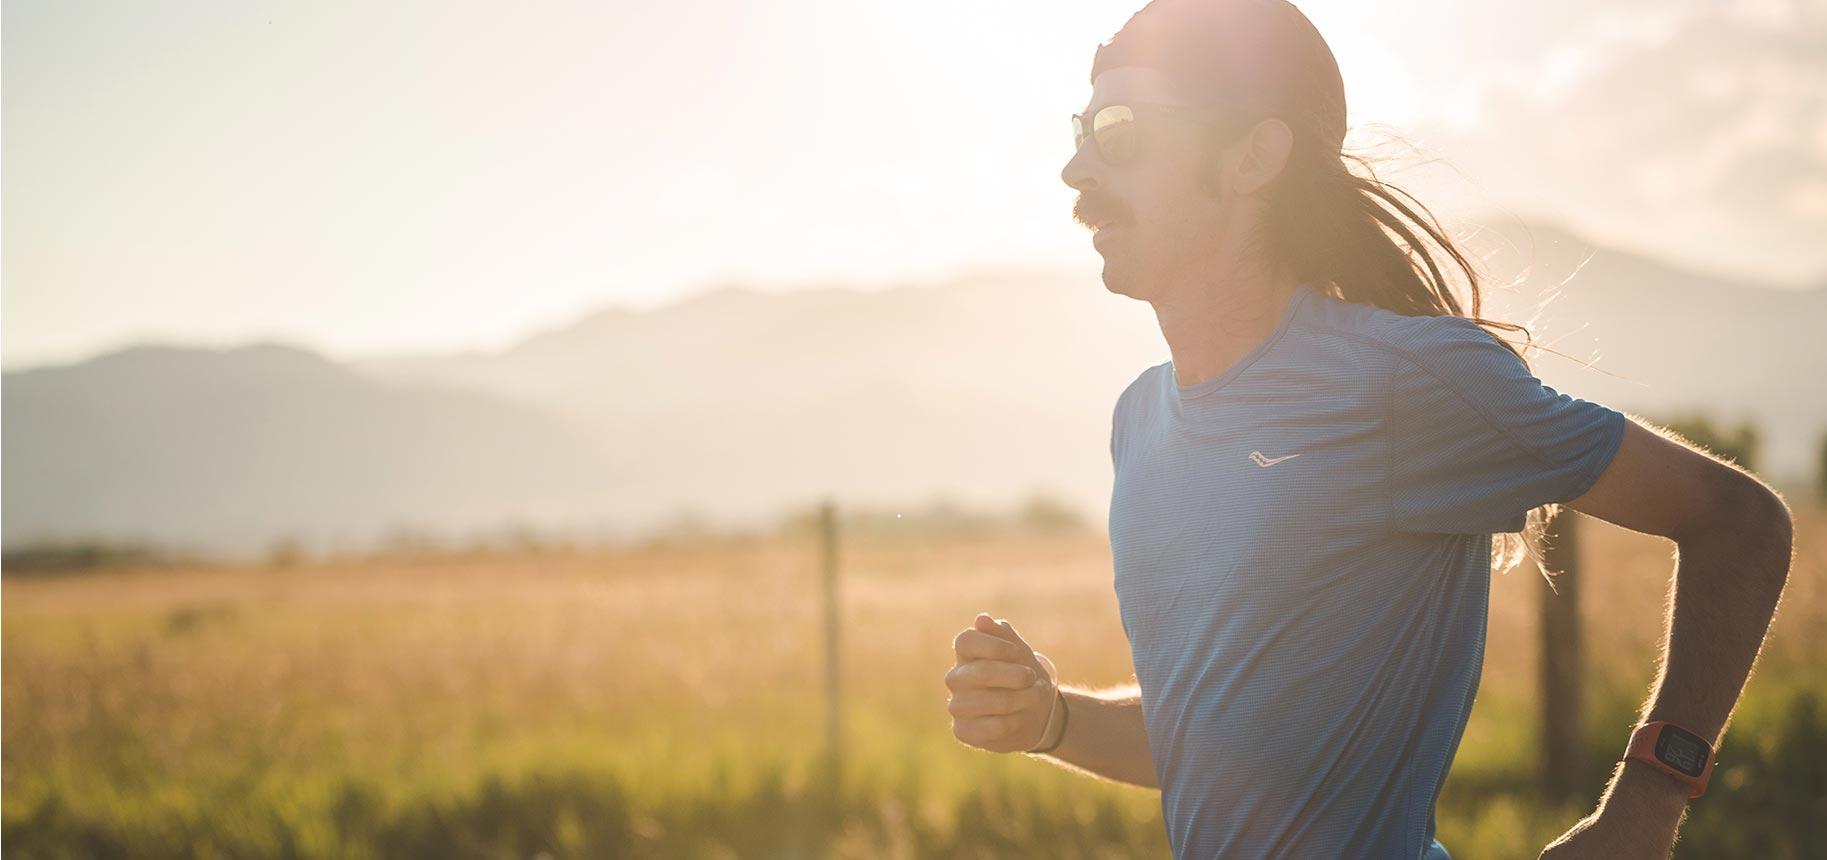 Noah Droddy running wearing a blue Saucony shirt with the sun gazing behind him.